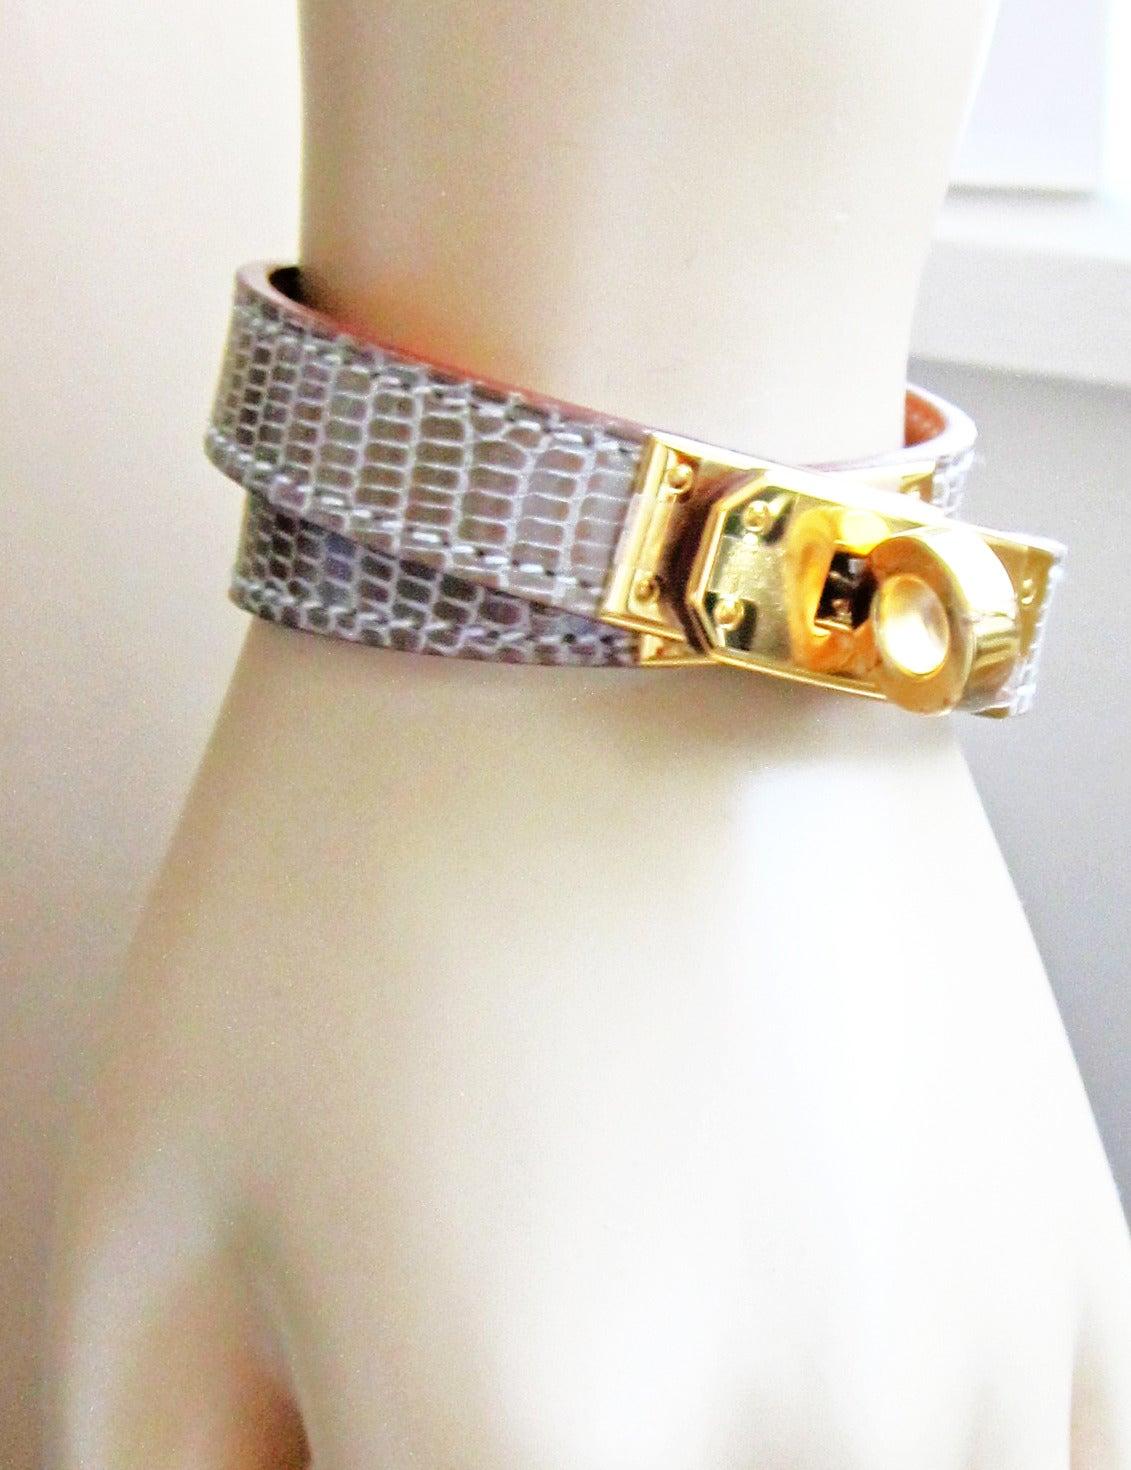 replica hermes kelly bag - Hermes Ficelle Lizard Niloticus Kelly Double Tour Gold Bracelet ...